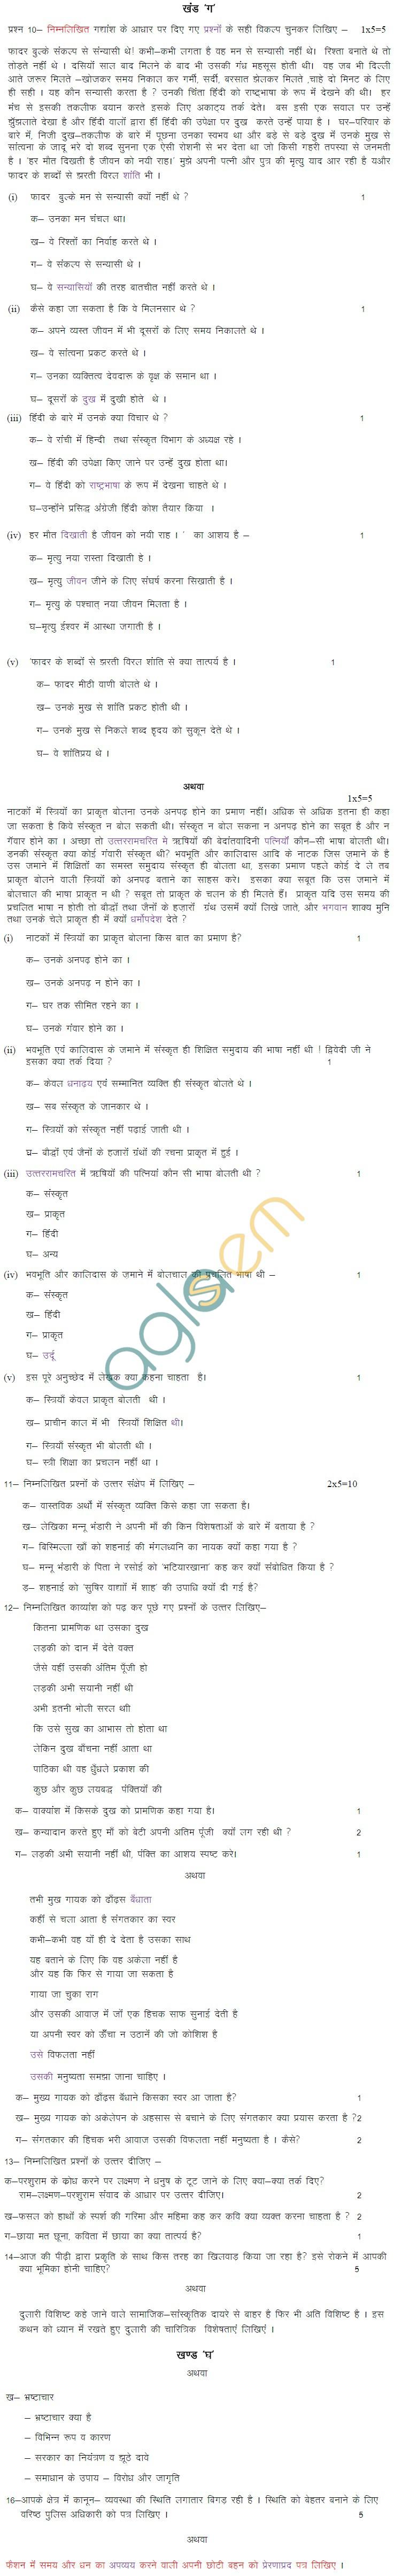 CBSE Board Exam 2013 Sample Papers (SA2) Class X - Hindi – A